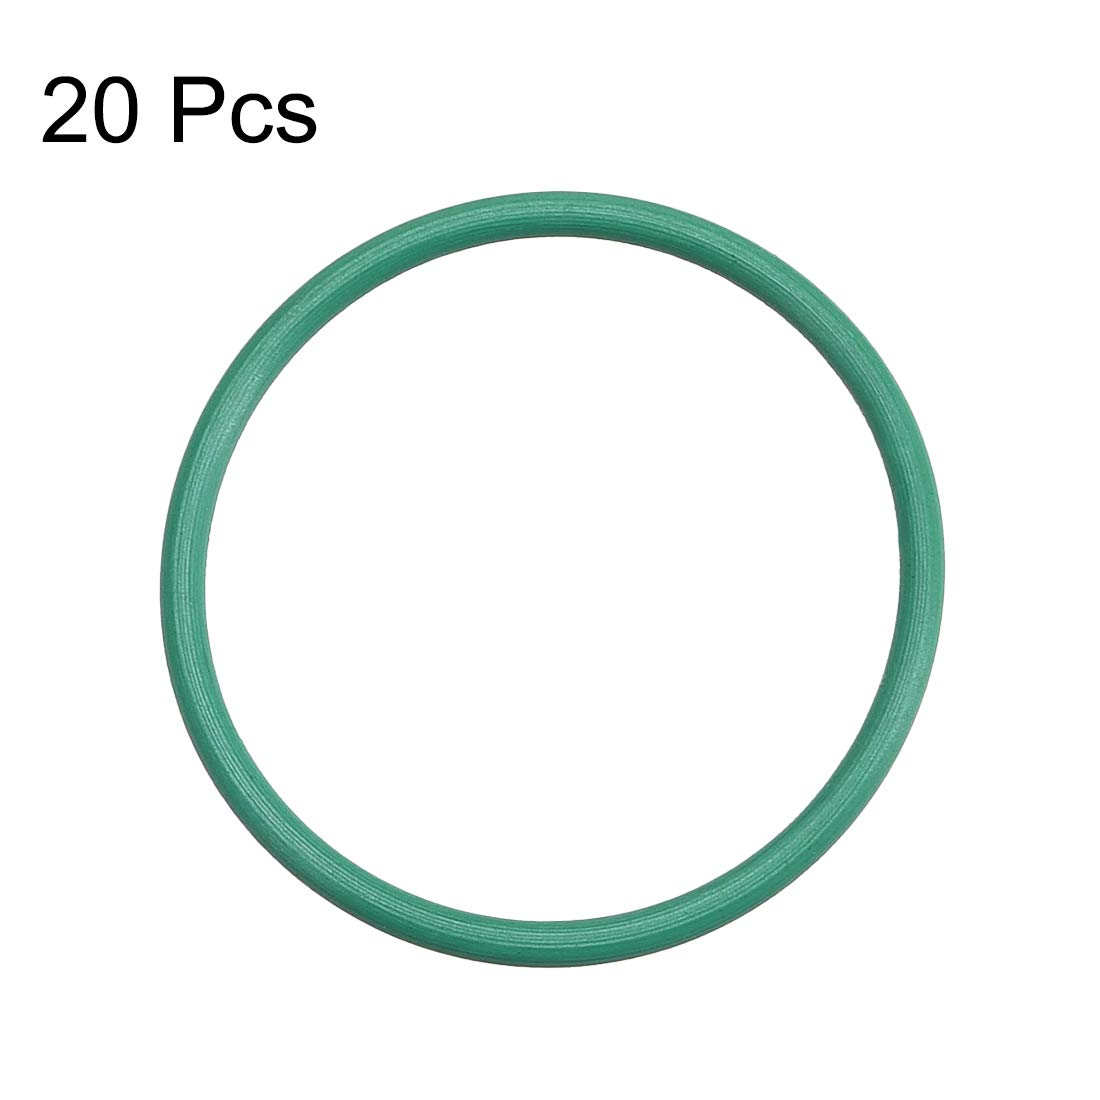 31mm OD uxcell Fluorine Rubber O Rings Seal Gasket Green 20Pcs 1.5mm Width 28mm Inner Diameter